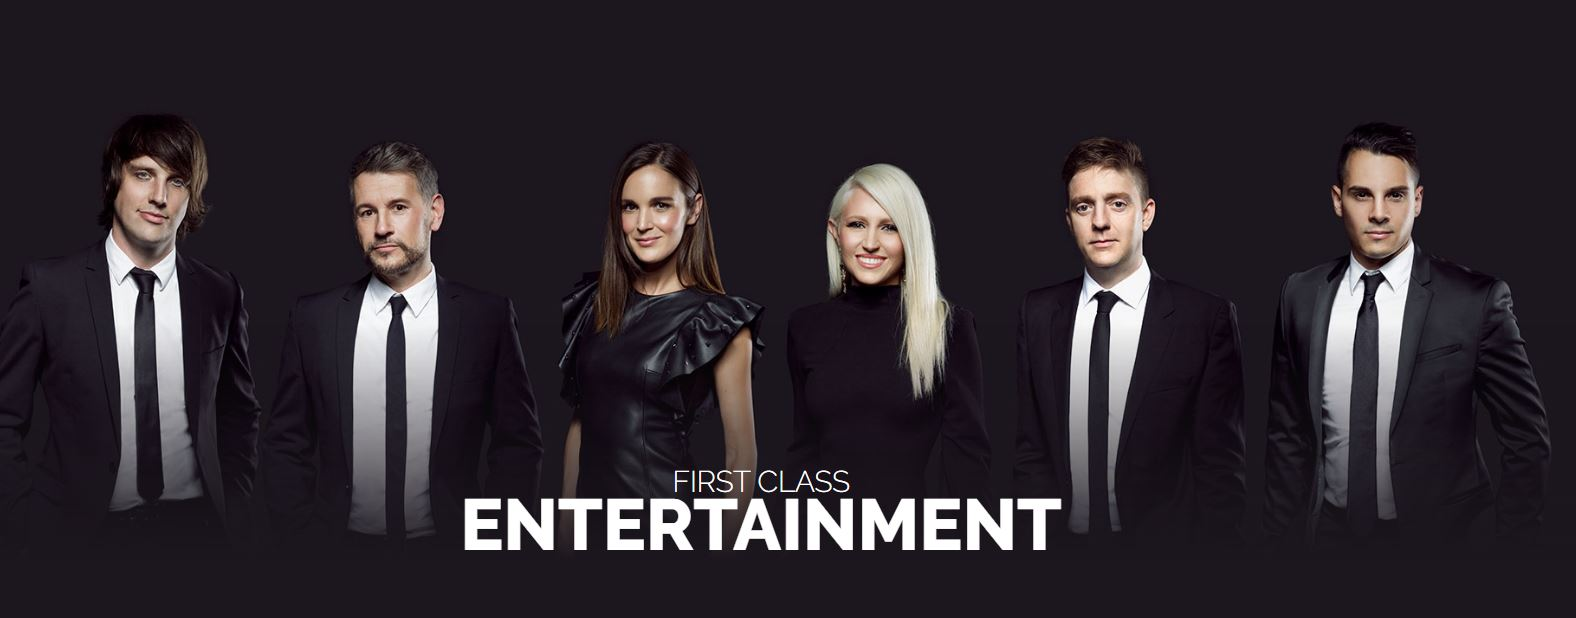 first class entertainment superband